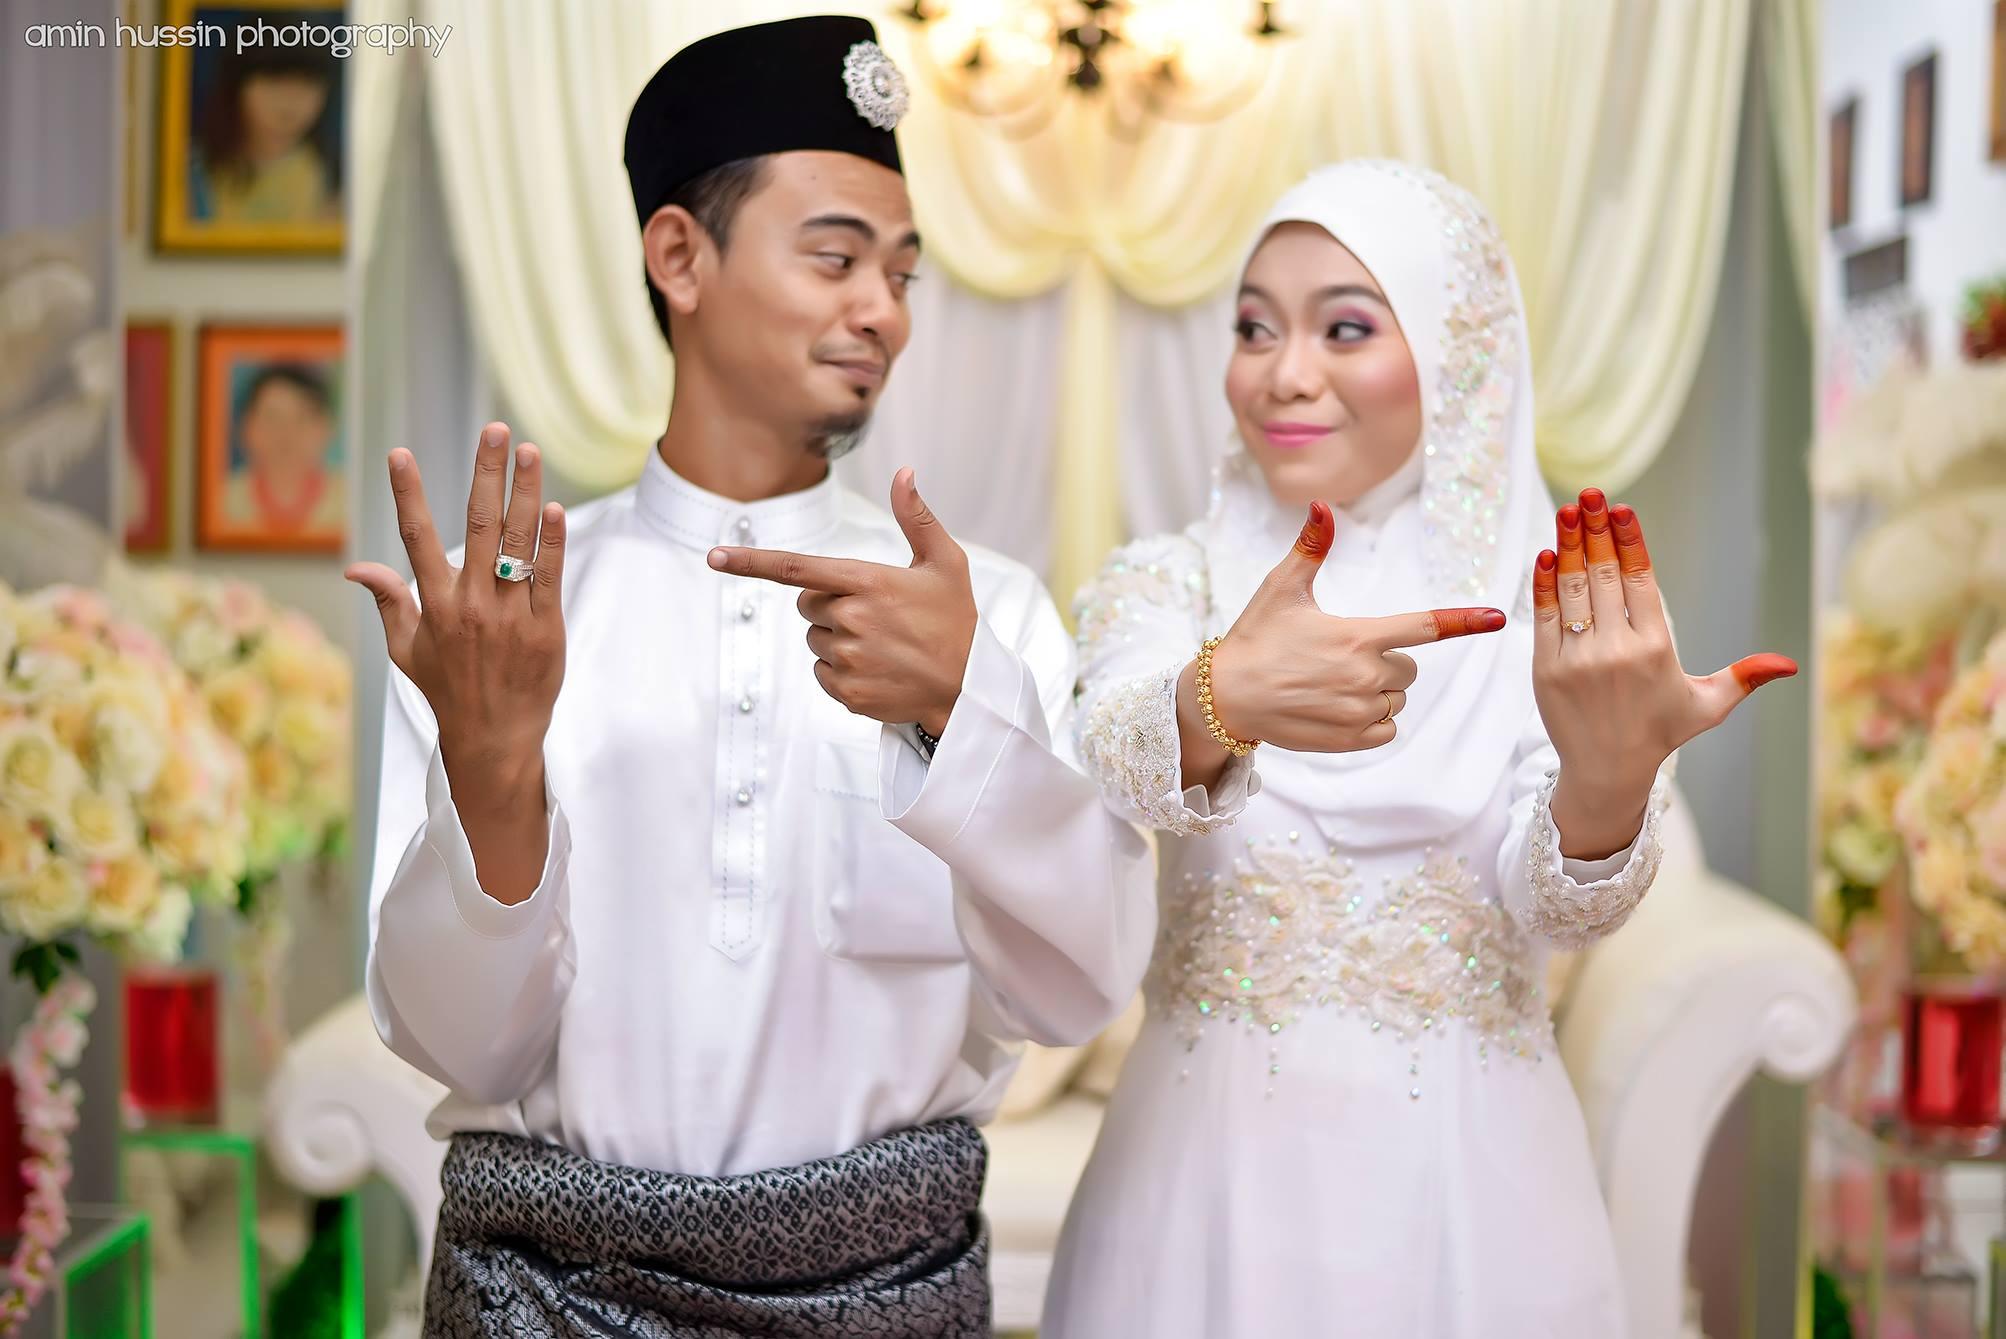 7 Fascinating Wedding Traditions Around The World: 7 Beautiful Muslim Wedding Customs Around The World